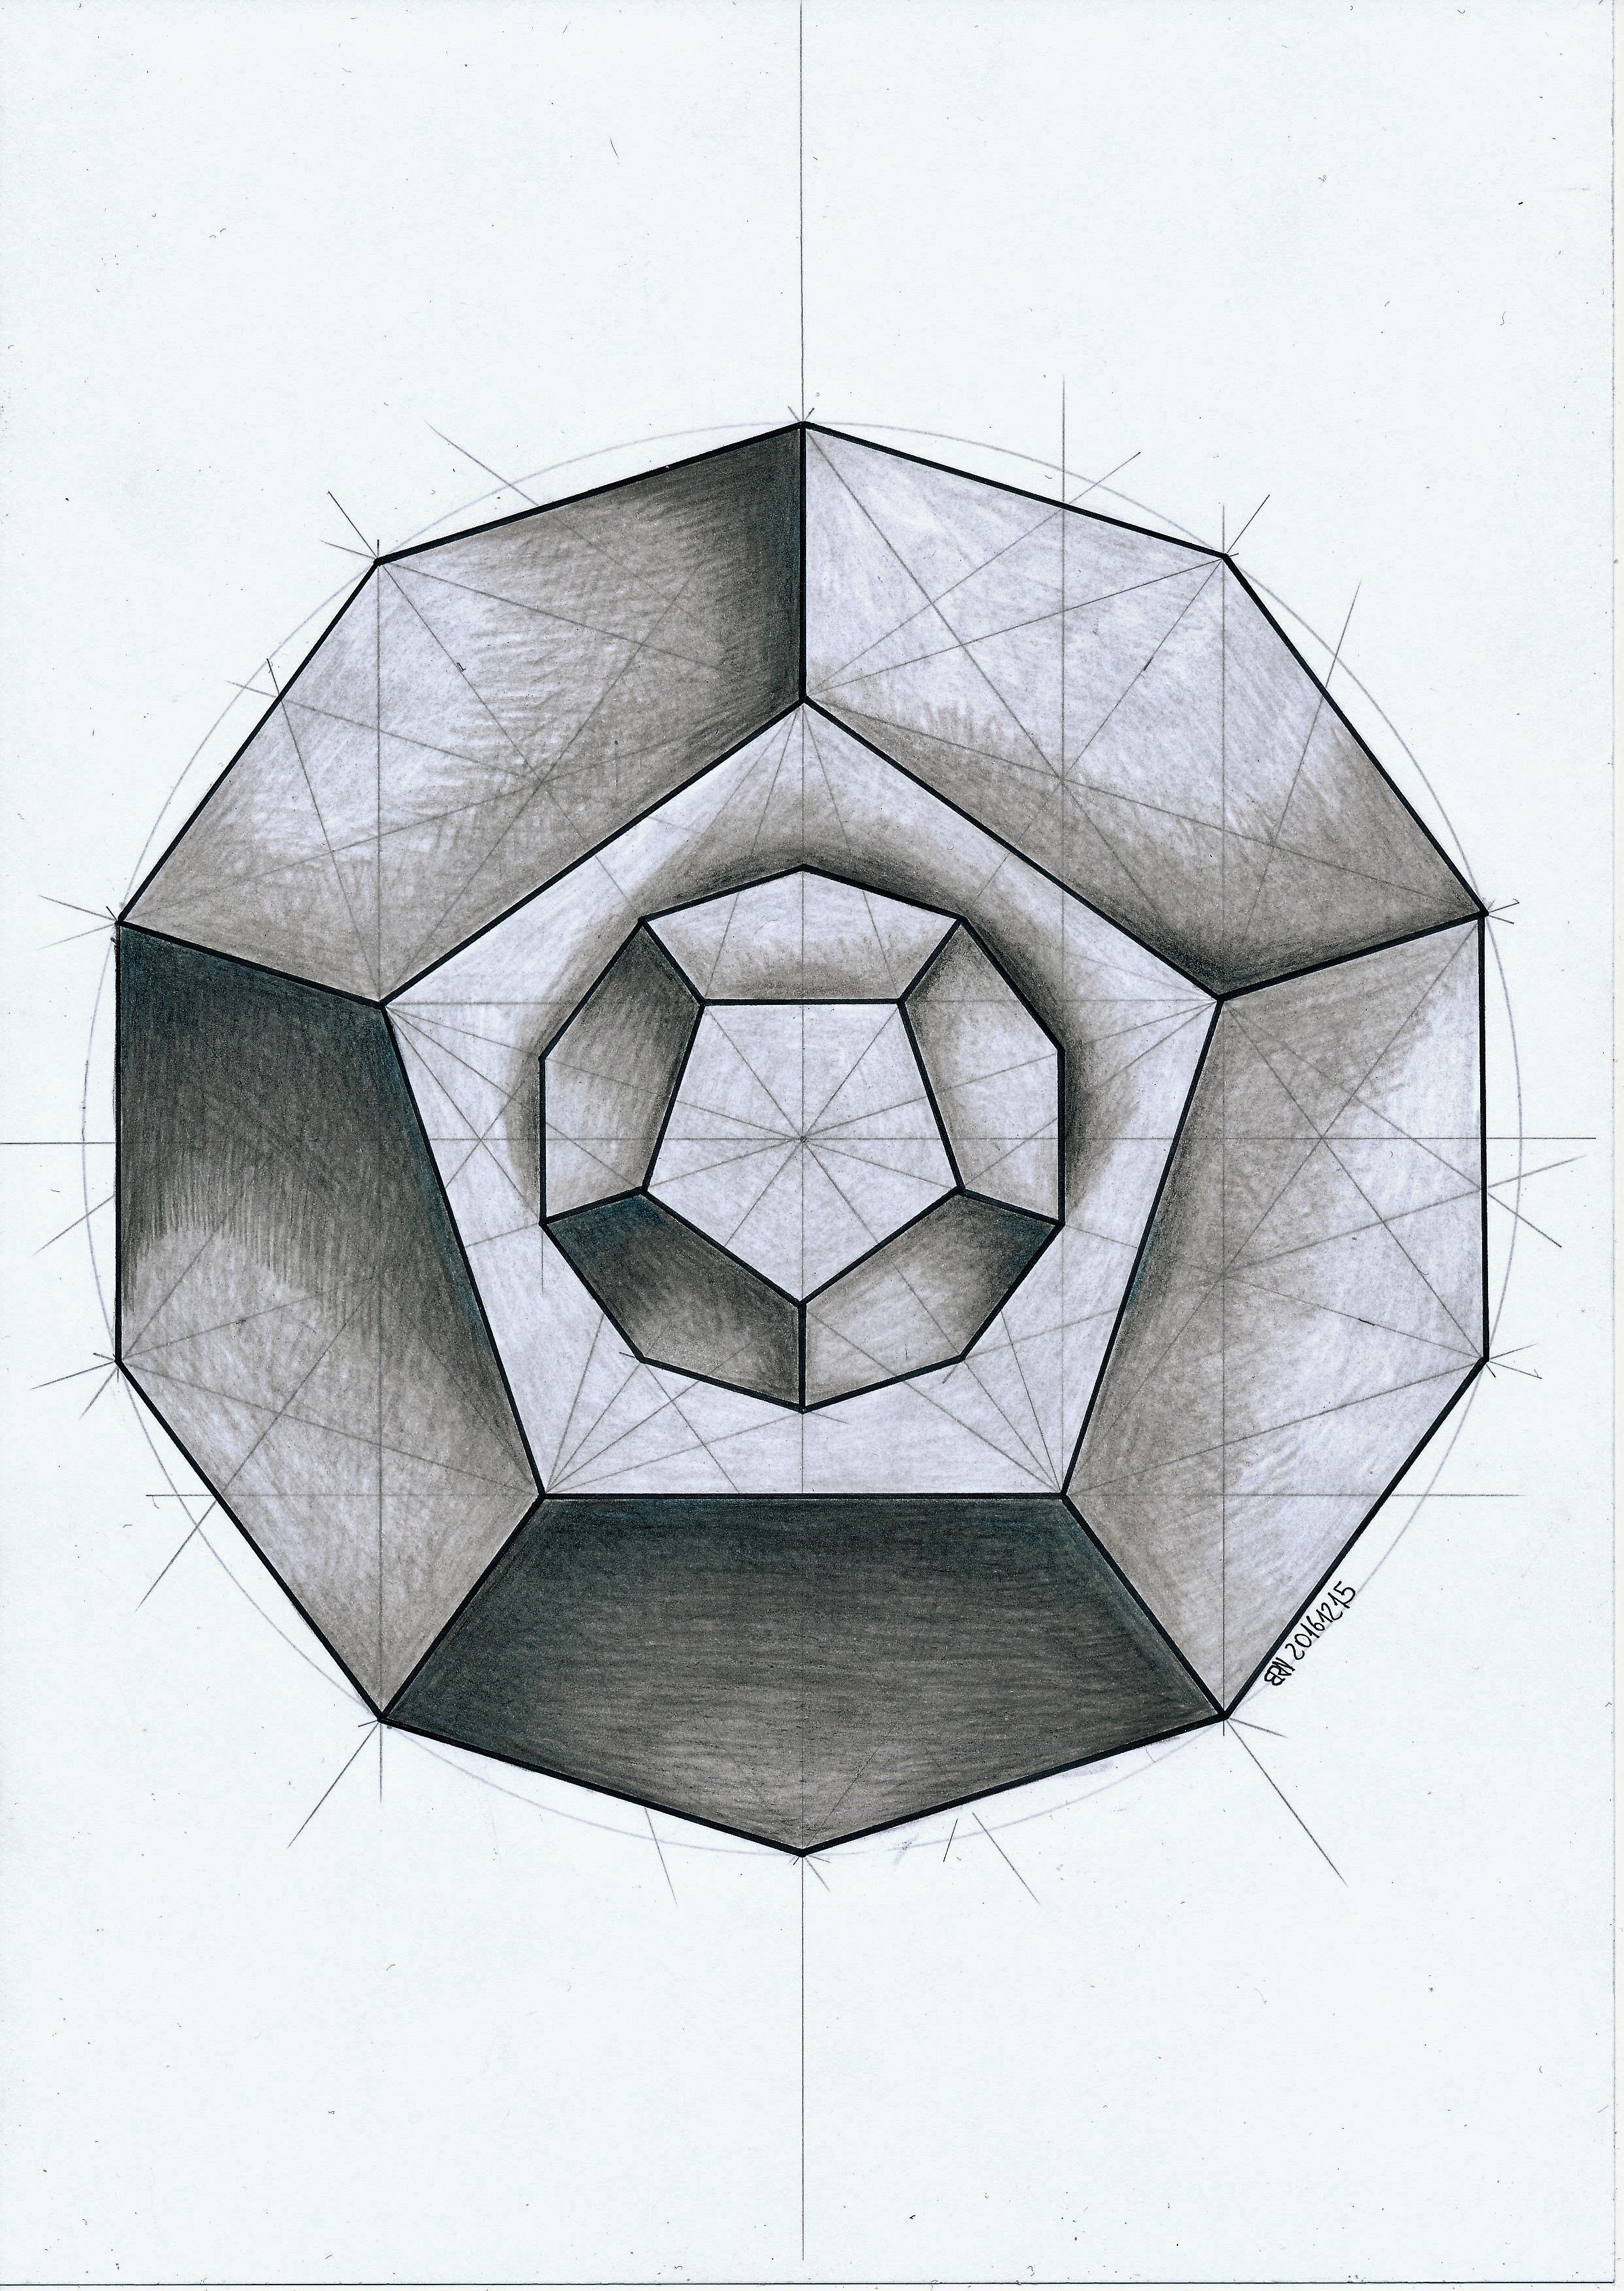 Polyhedra Solid Geometry Symmetry Handmade Pencil